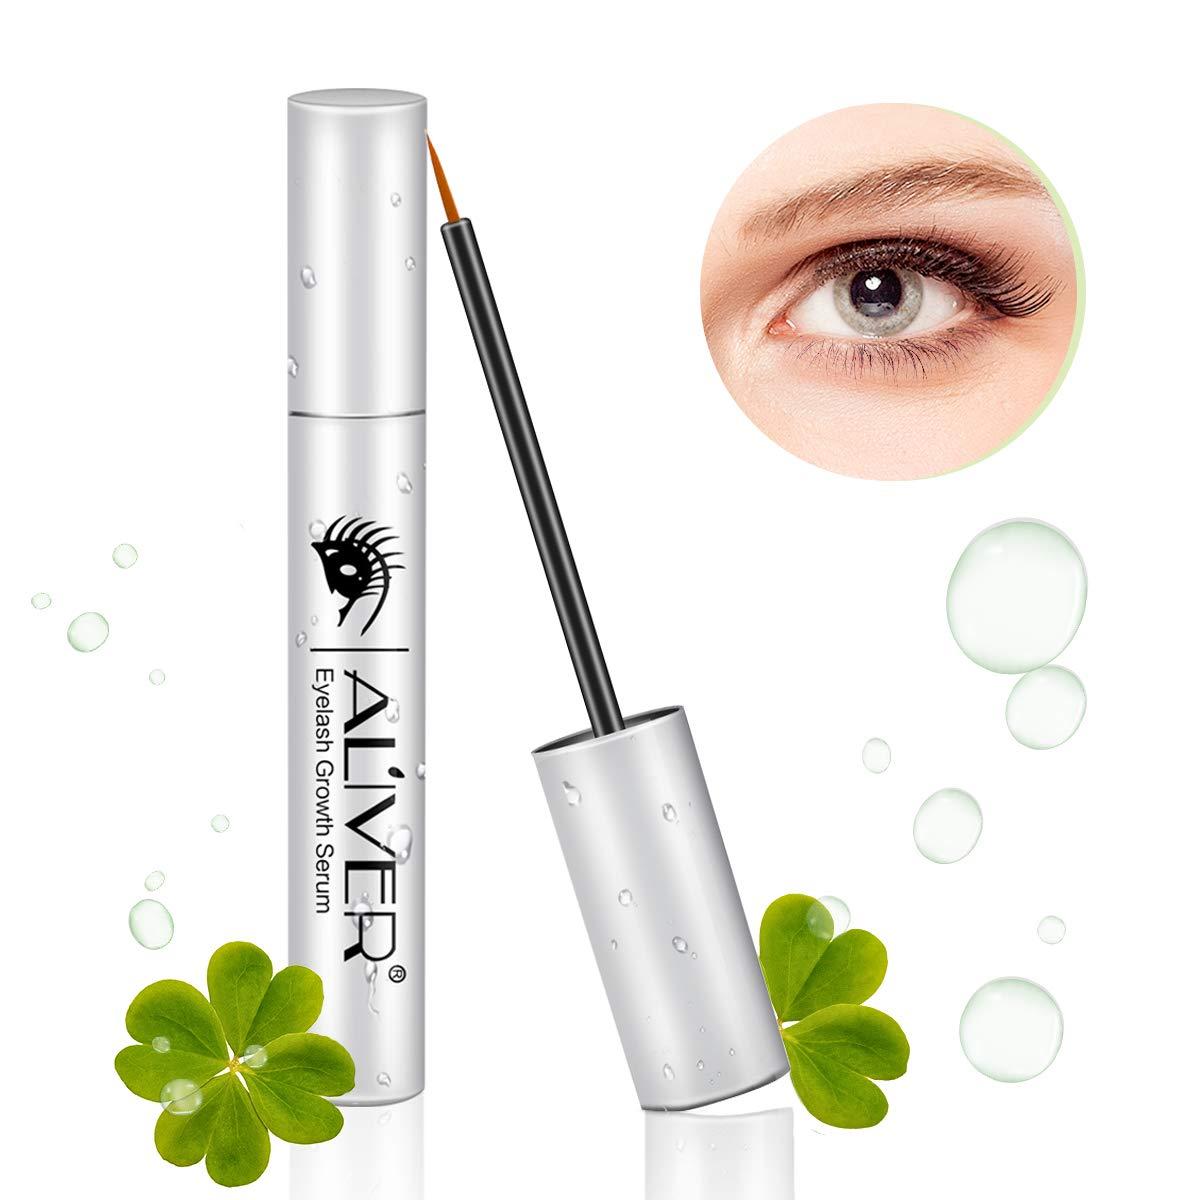 Eyelash Growth Serum, Natural Eyebrow Enhancer, Brow & Lash Enhancing Formula for Longer, Thicker Eyelashes and Eyebrows 5ML